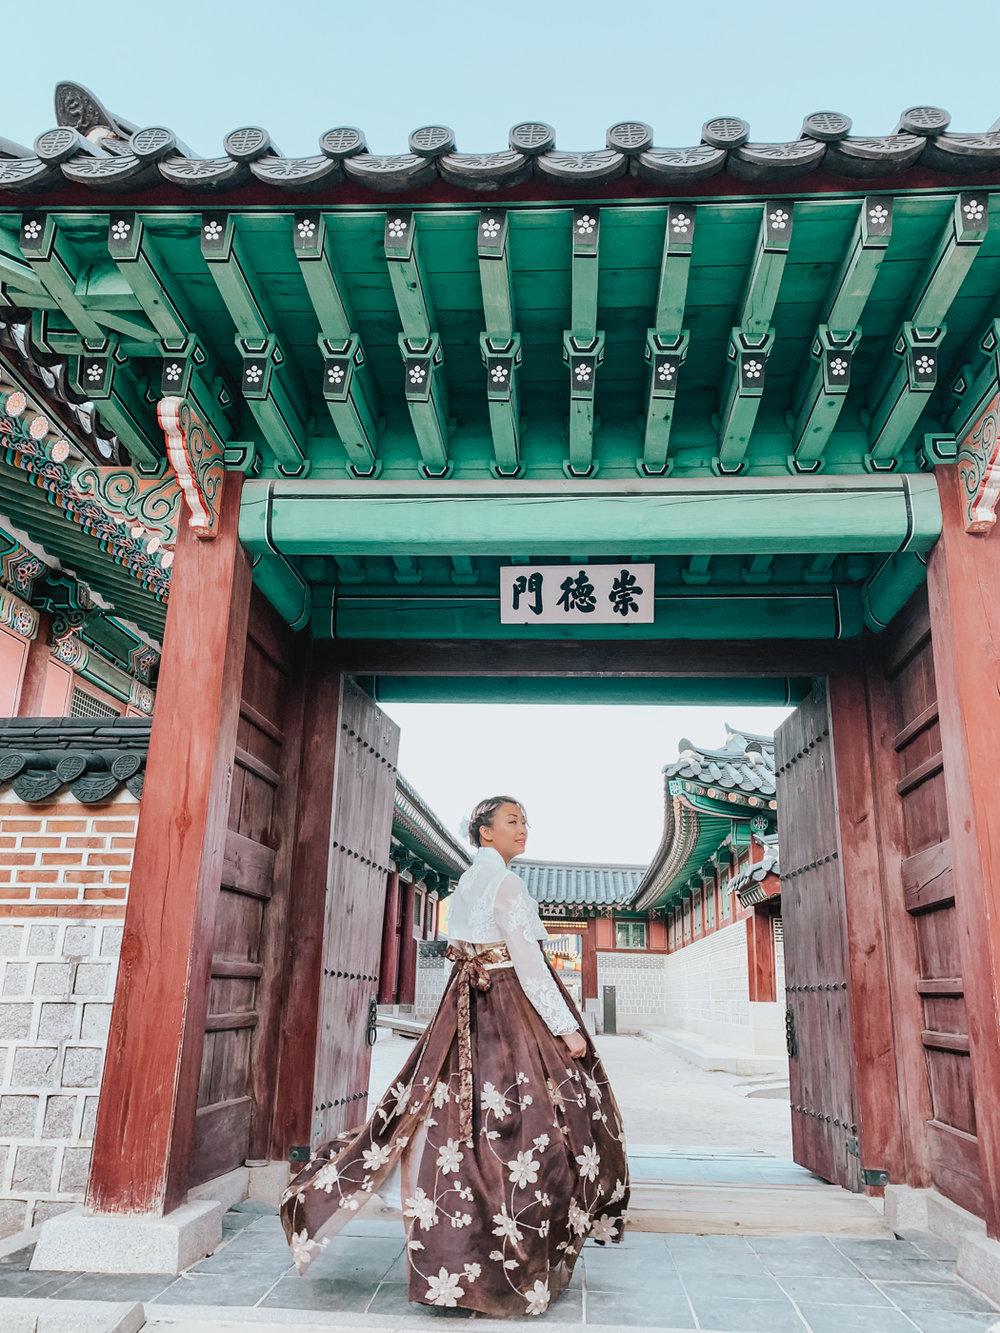 Wearing a Hanbok in Gyeongbokgung | Seoul, Korea Travel Guide | The Chic Diary